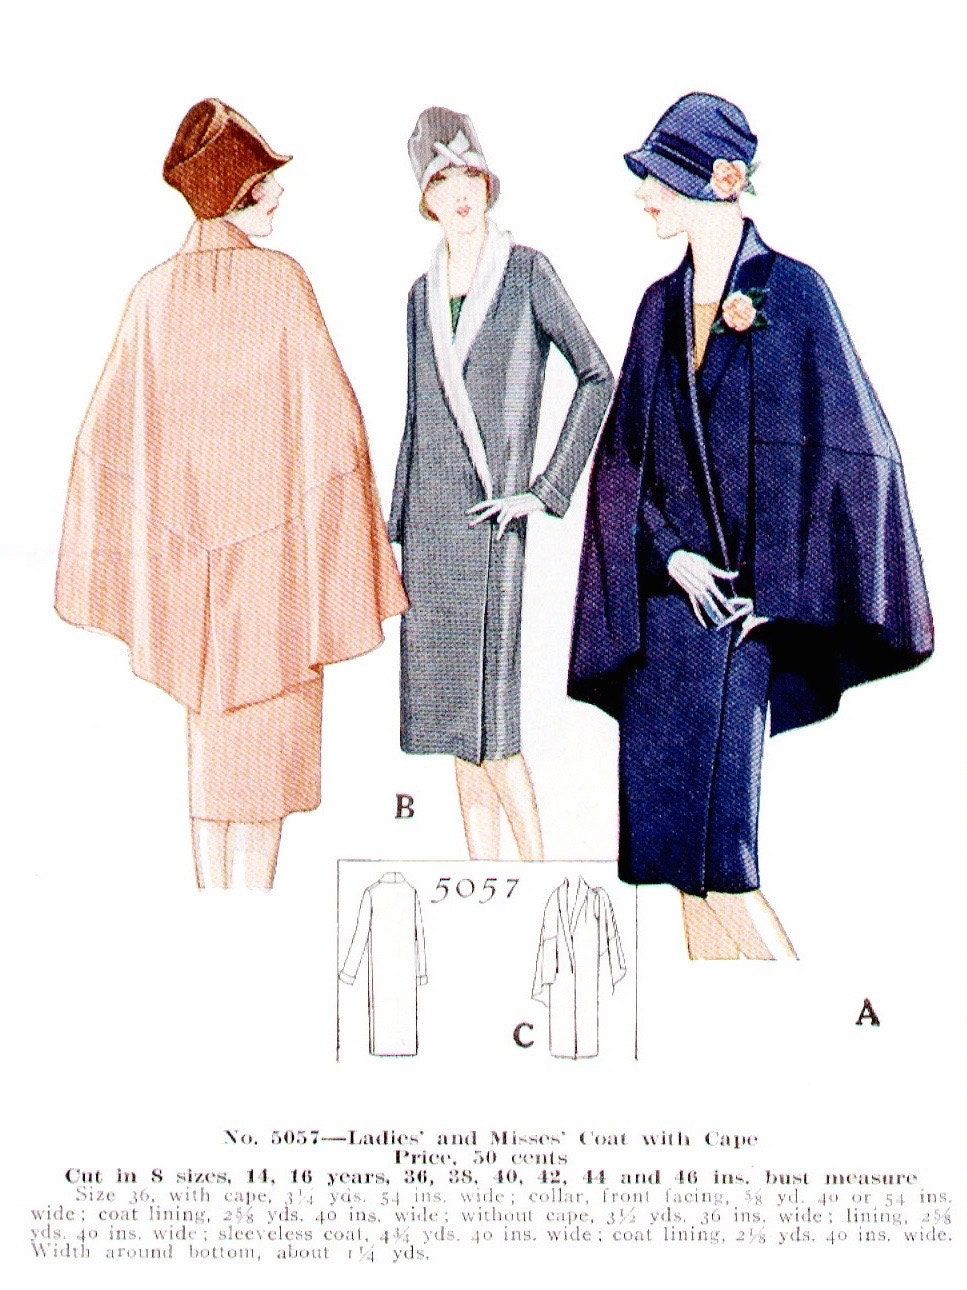 1920s coat pattern illustration - McCall 5057 (M7259)